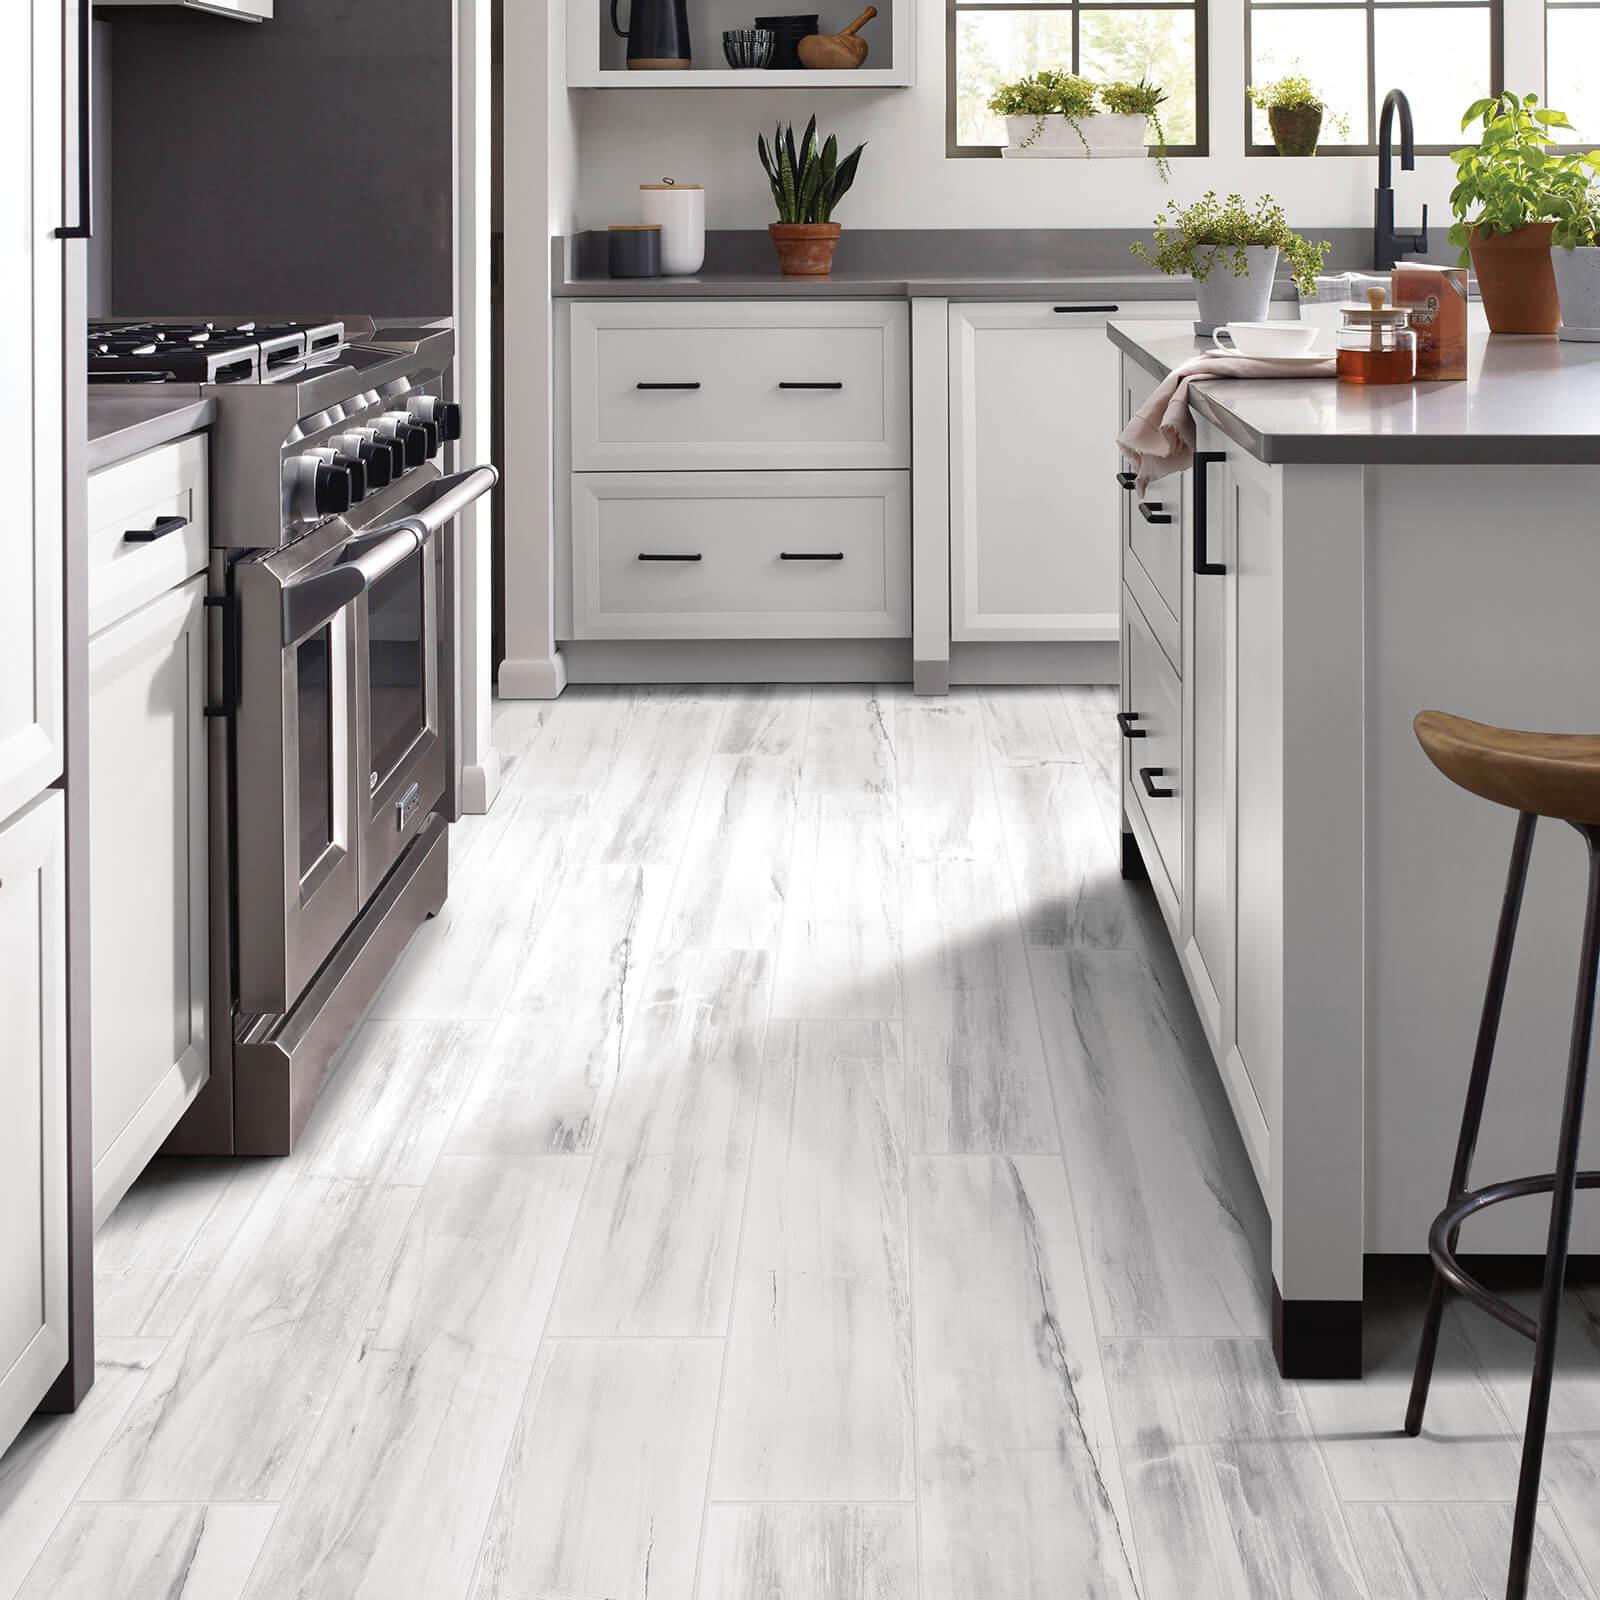 Kitchen interior design | Dolphin Carpet & Tile